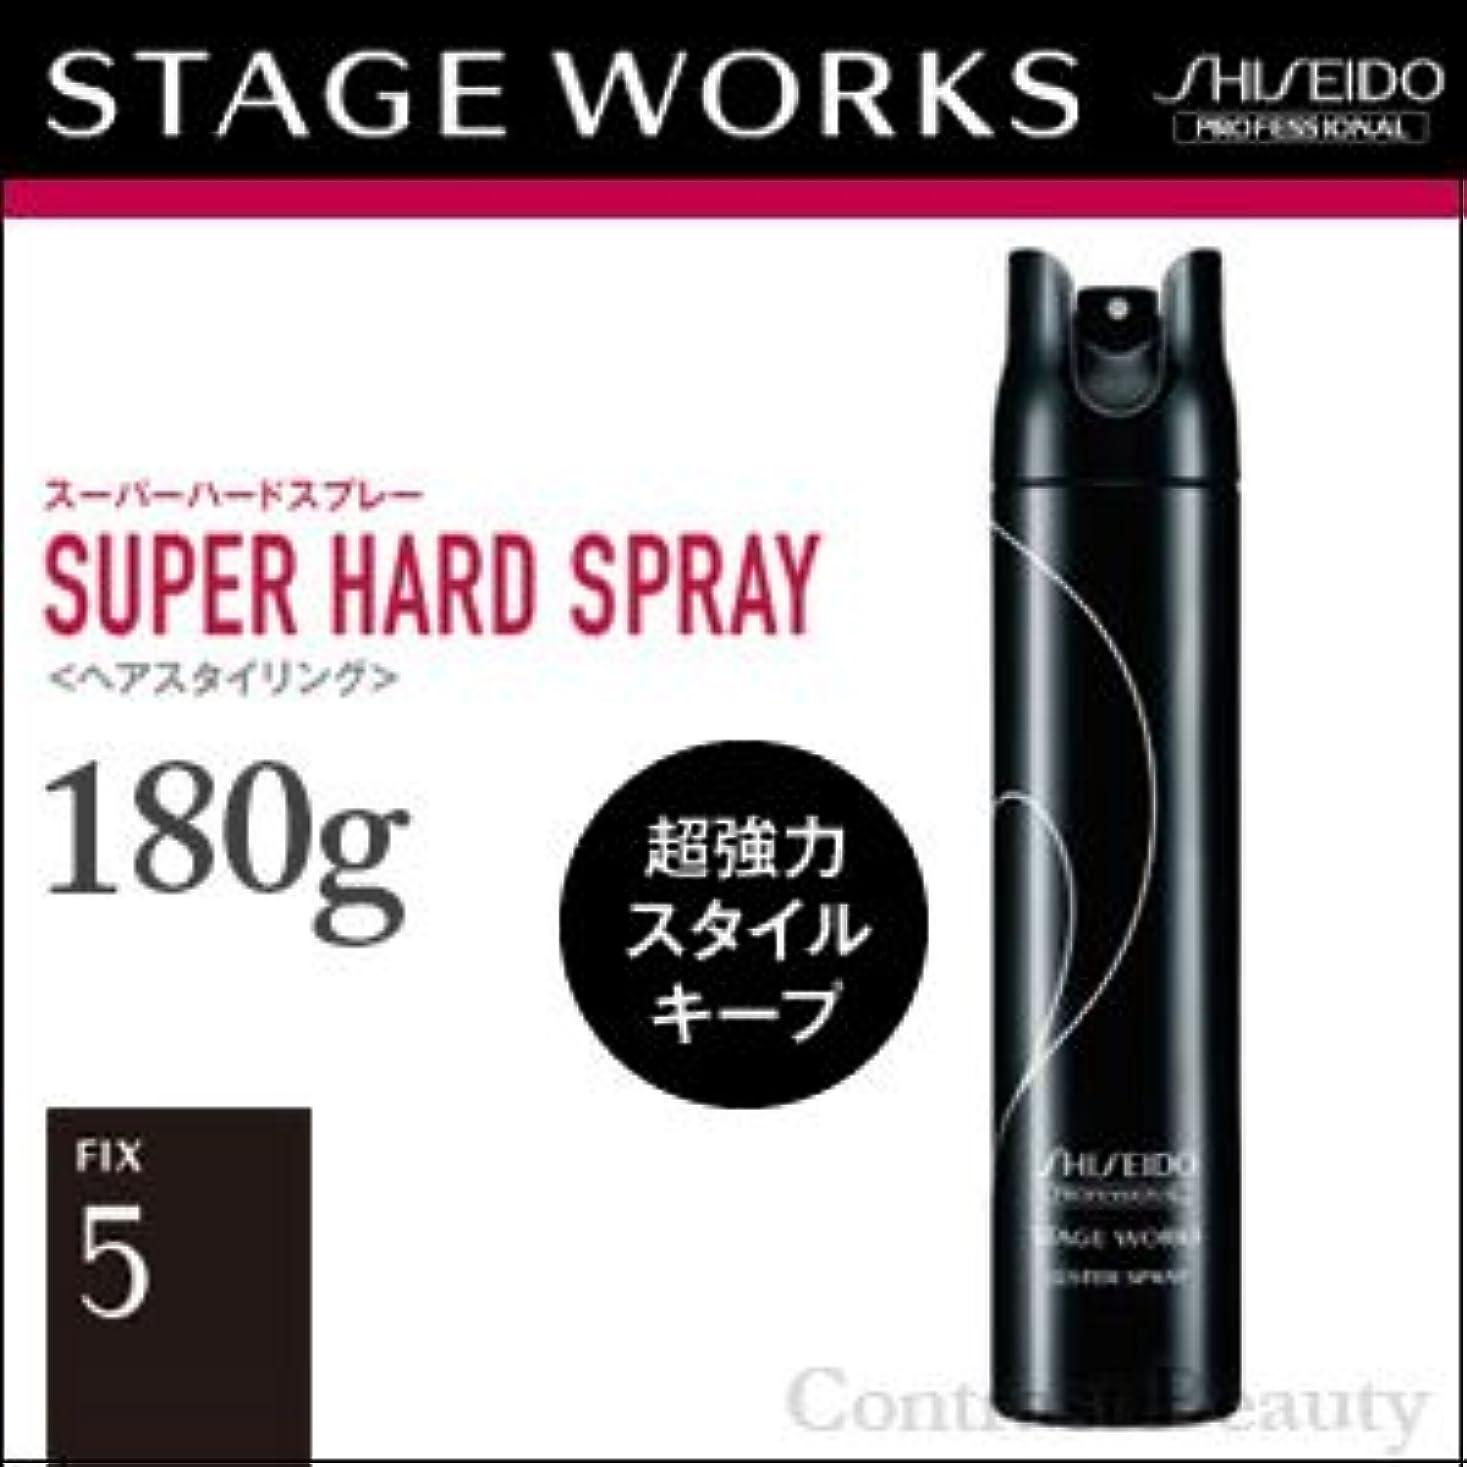 【x5個セット】 資生堂 ステージワークス フィックス5 スーパーハードスプレー 180g